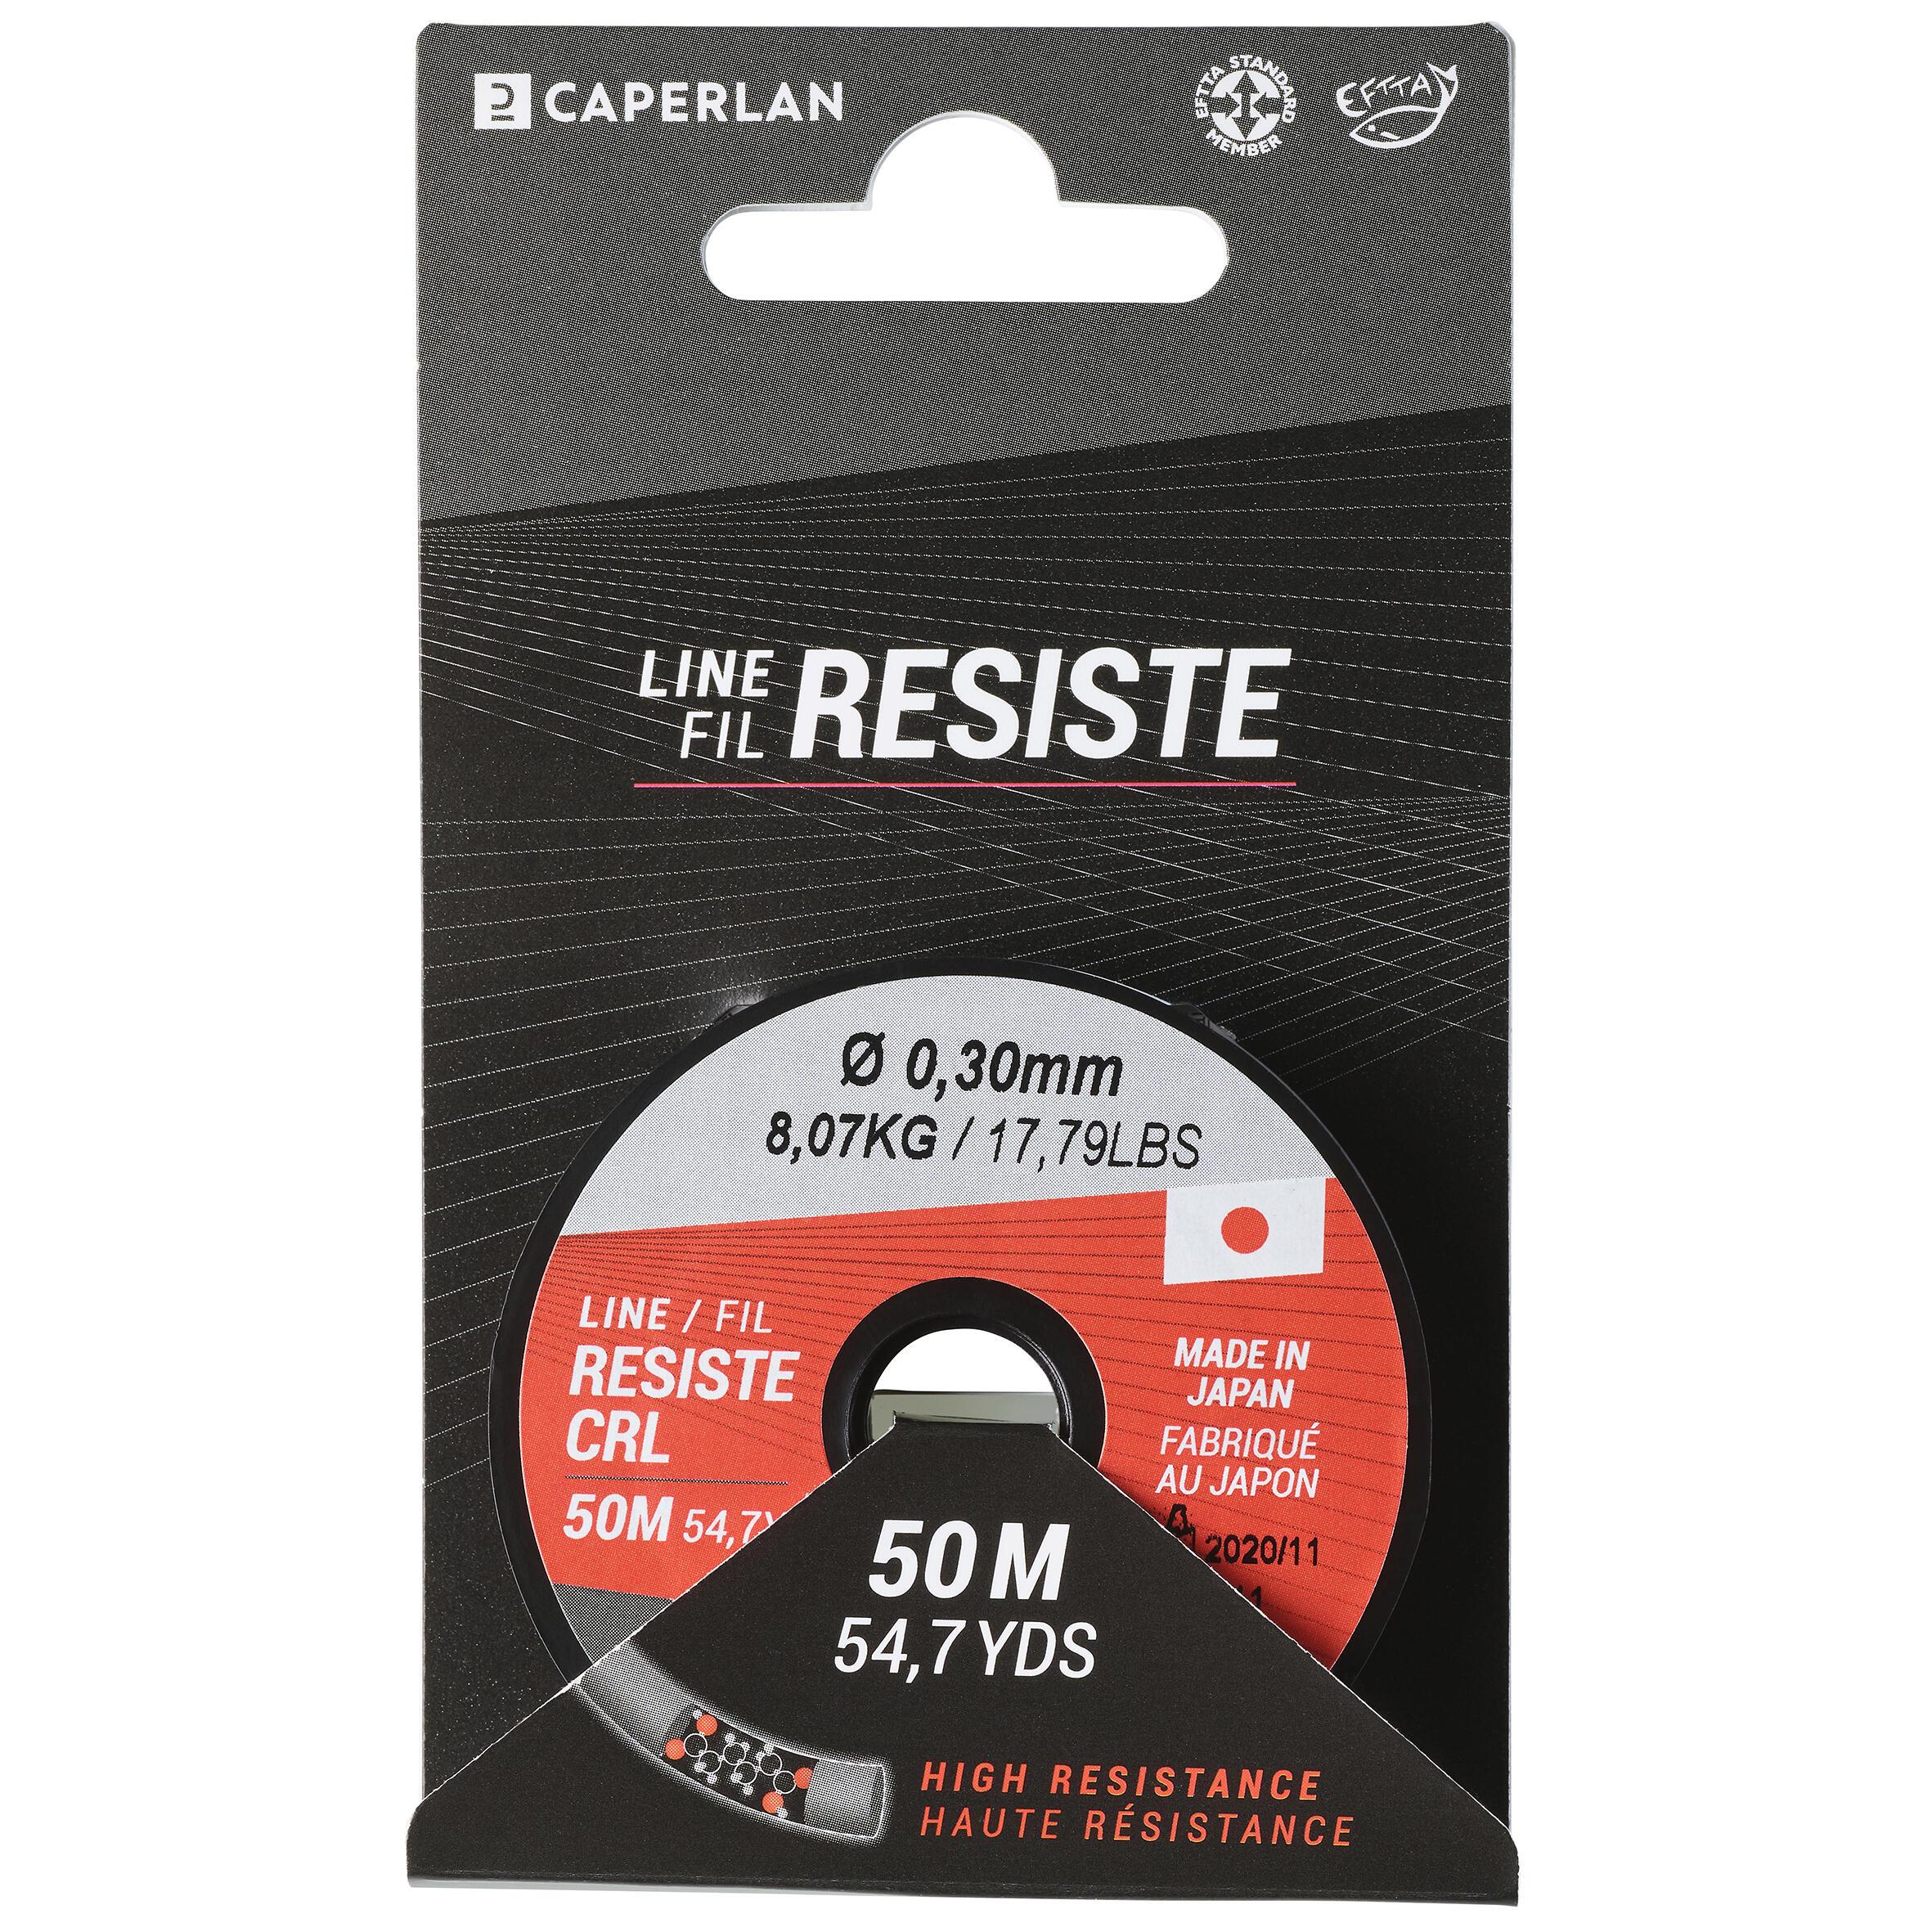 Fir Line Resist CRL 50m 30/100 la Reducere poza